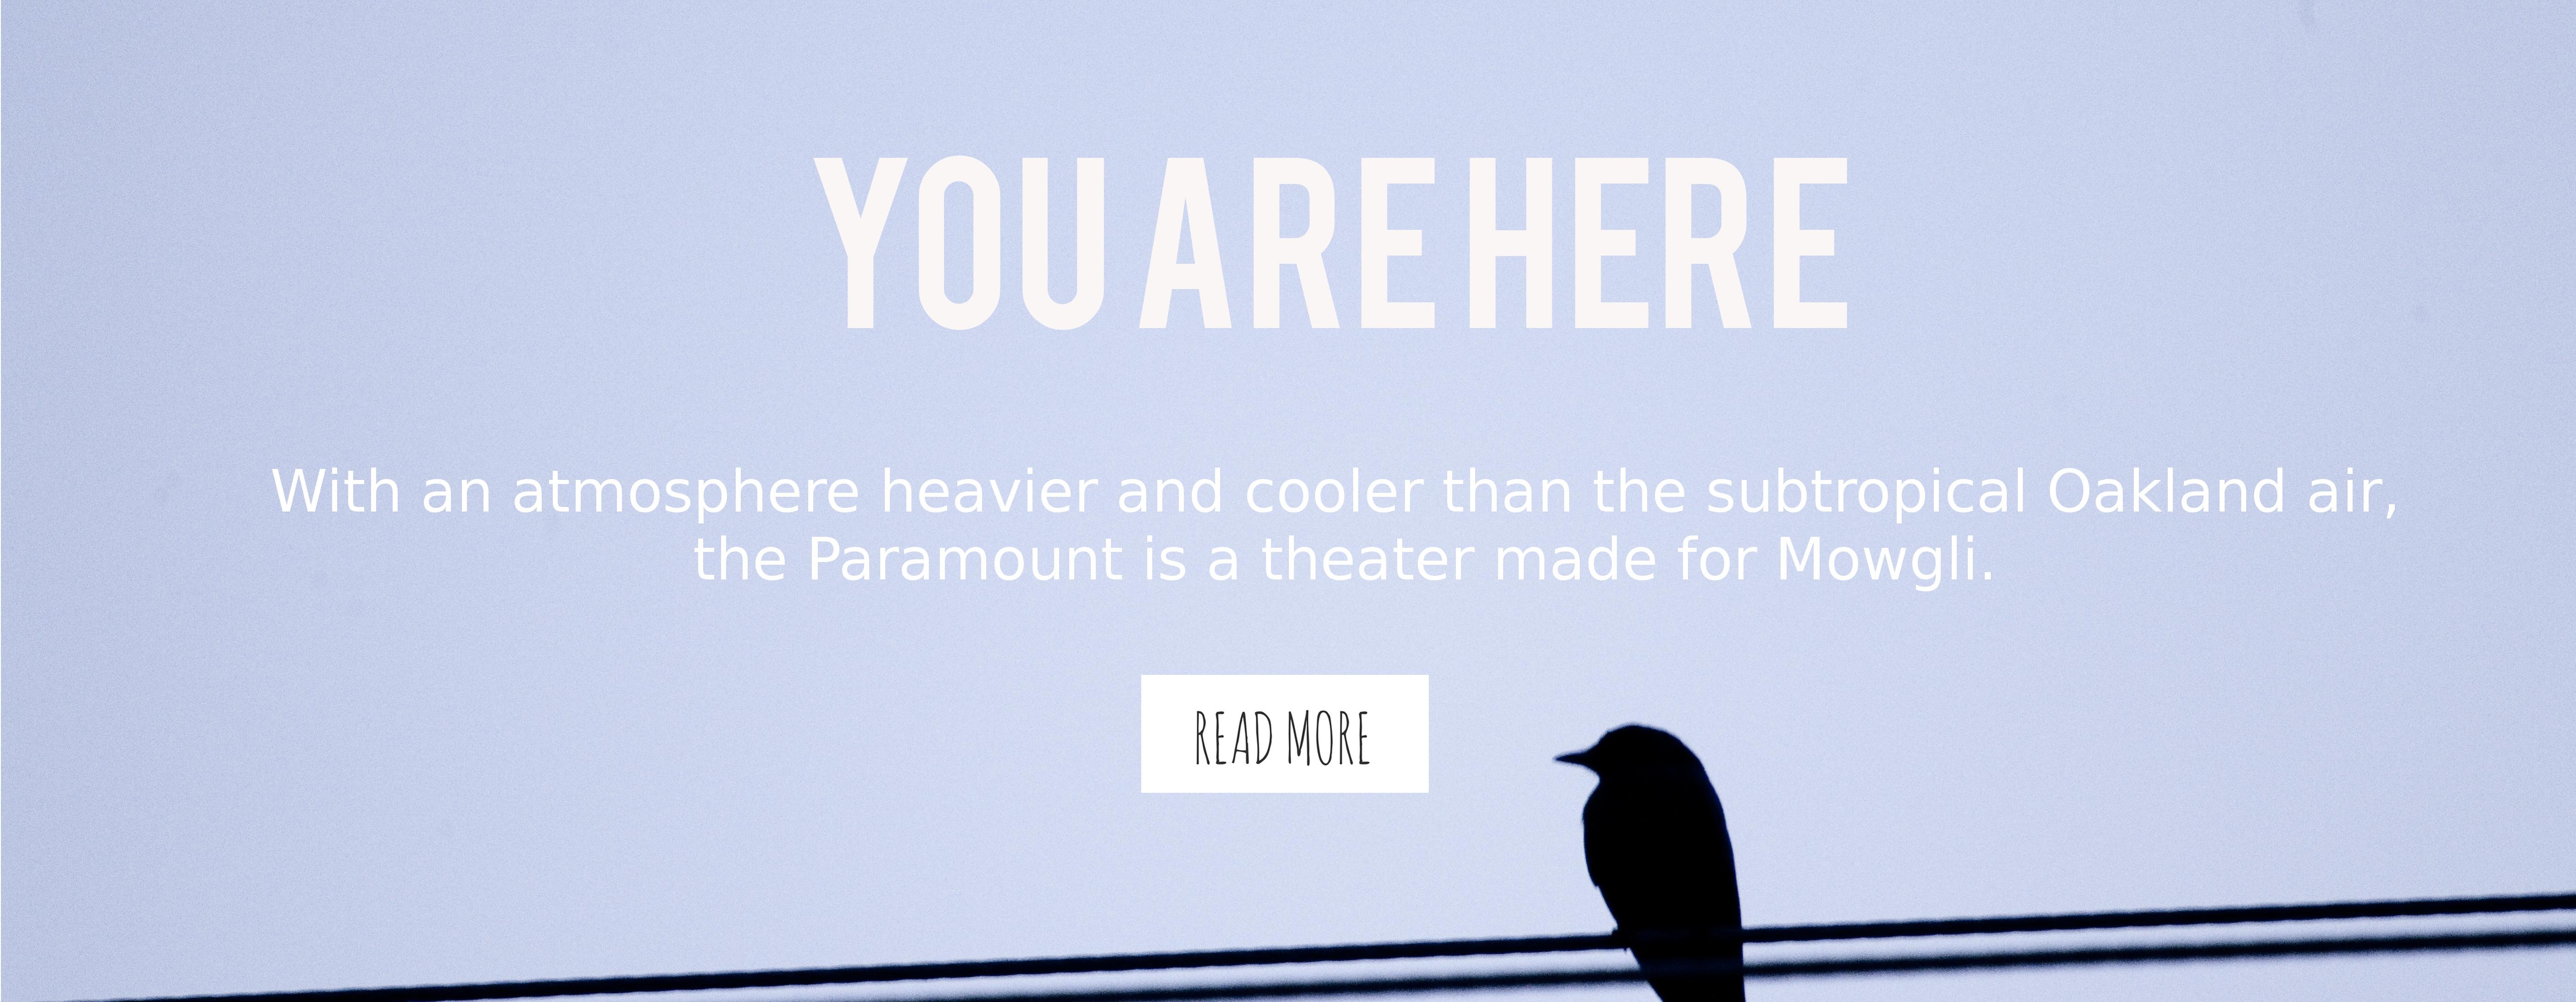 youarehere-readmore